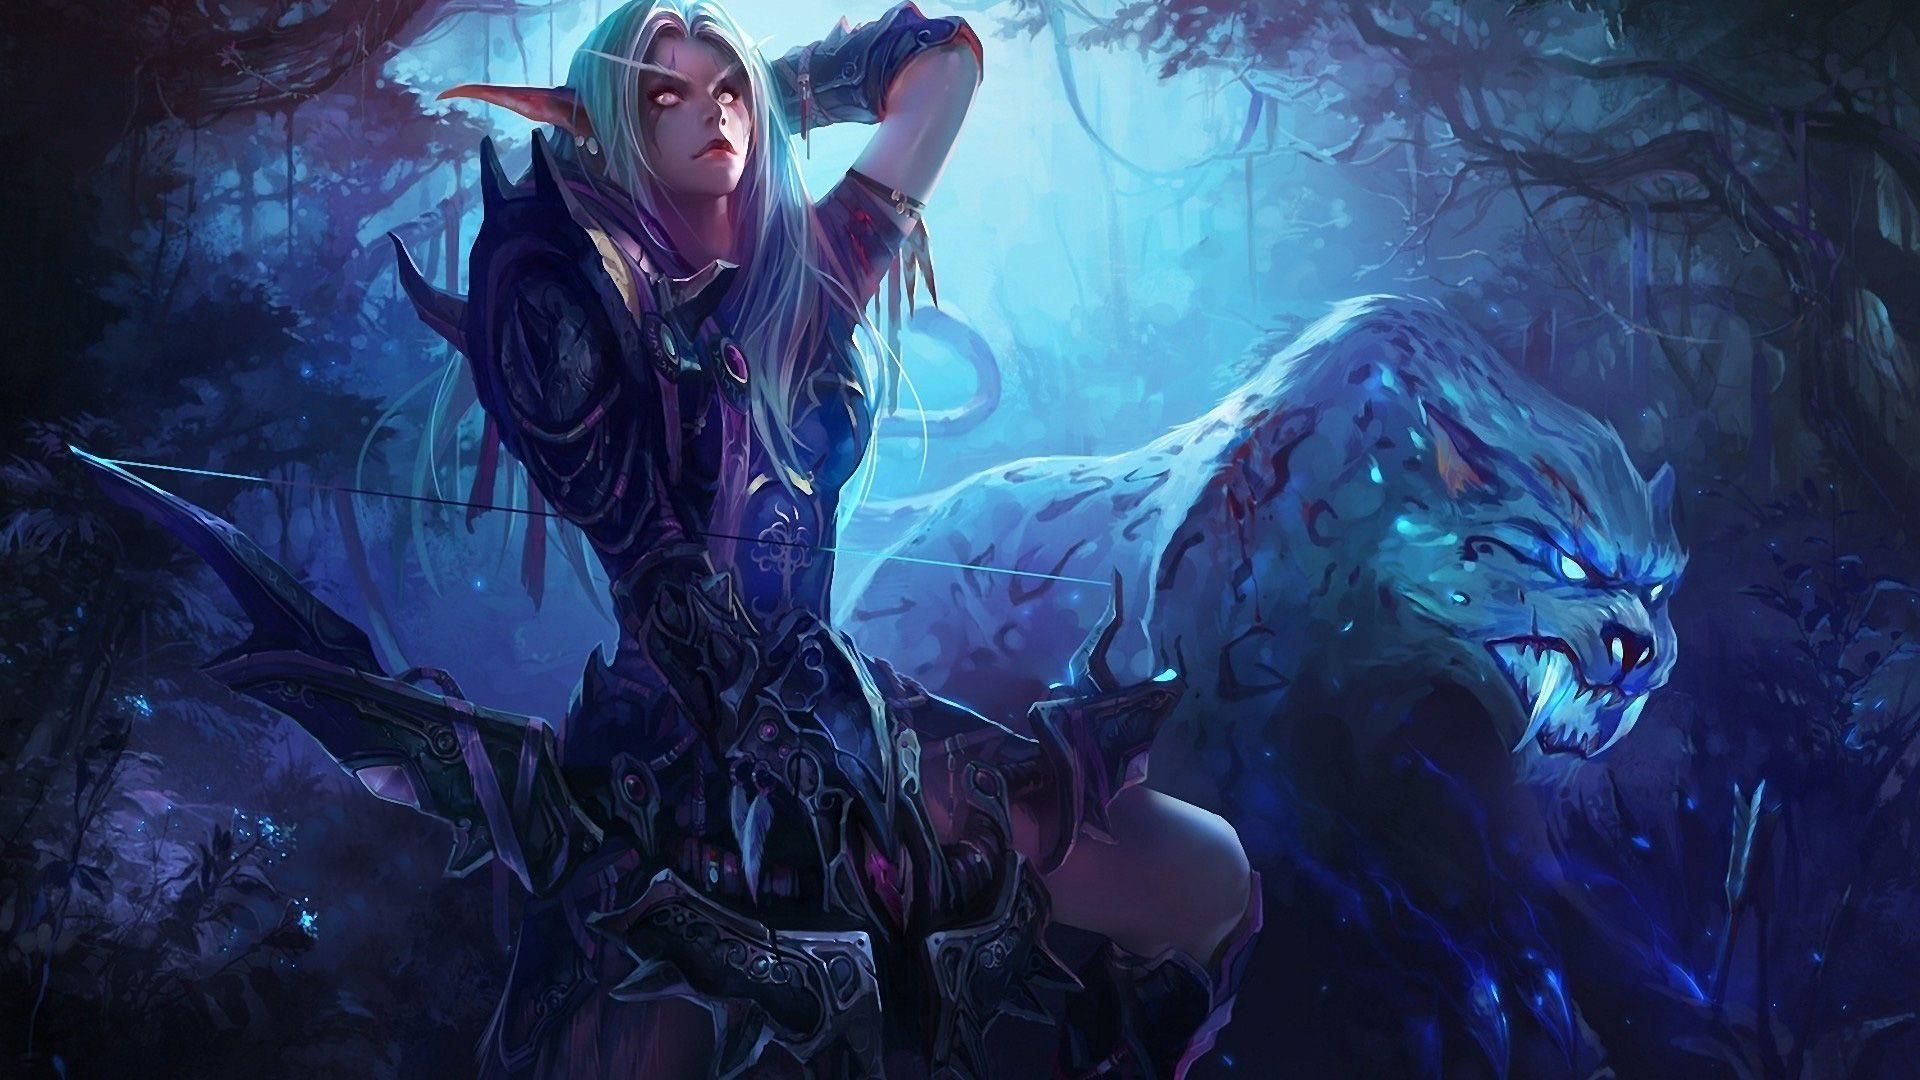 Best Ideas About World Of Warcraft Wallpaper On Pinterest